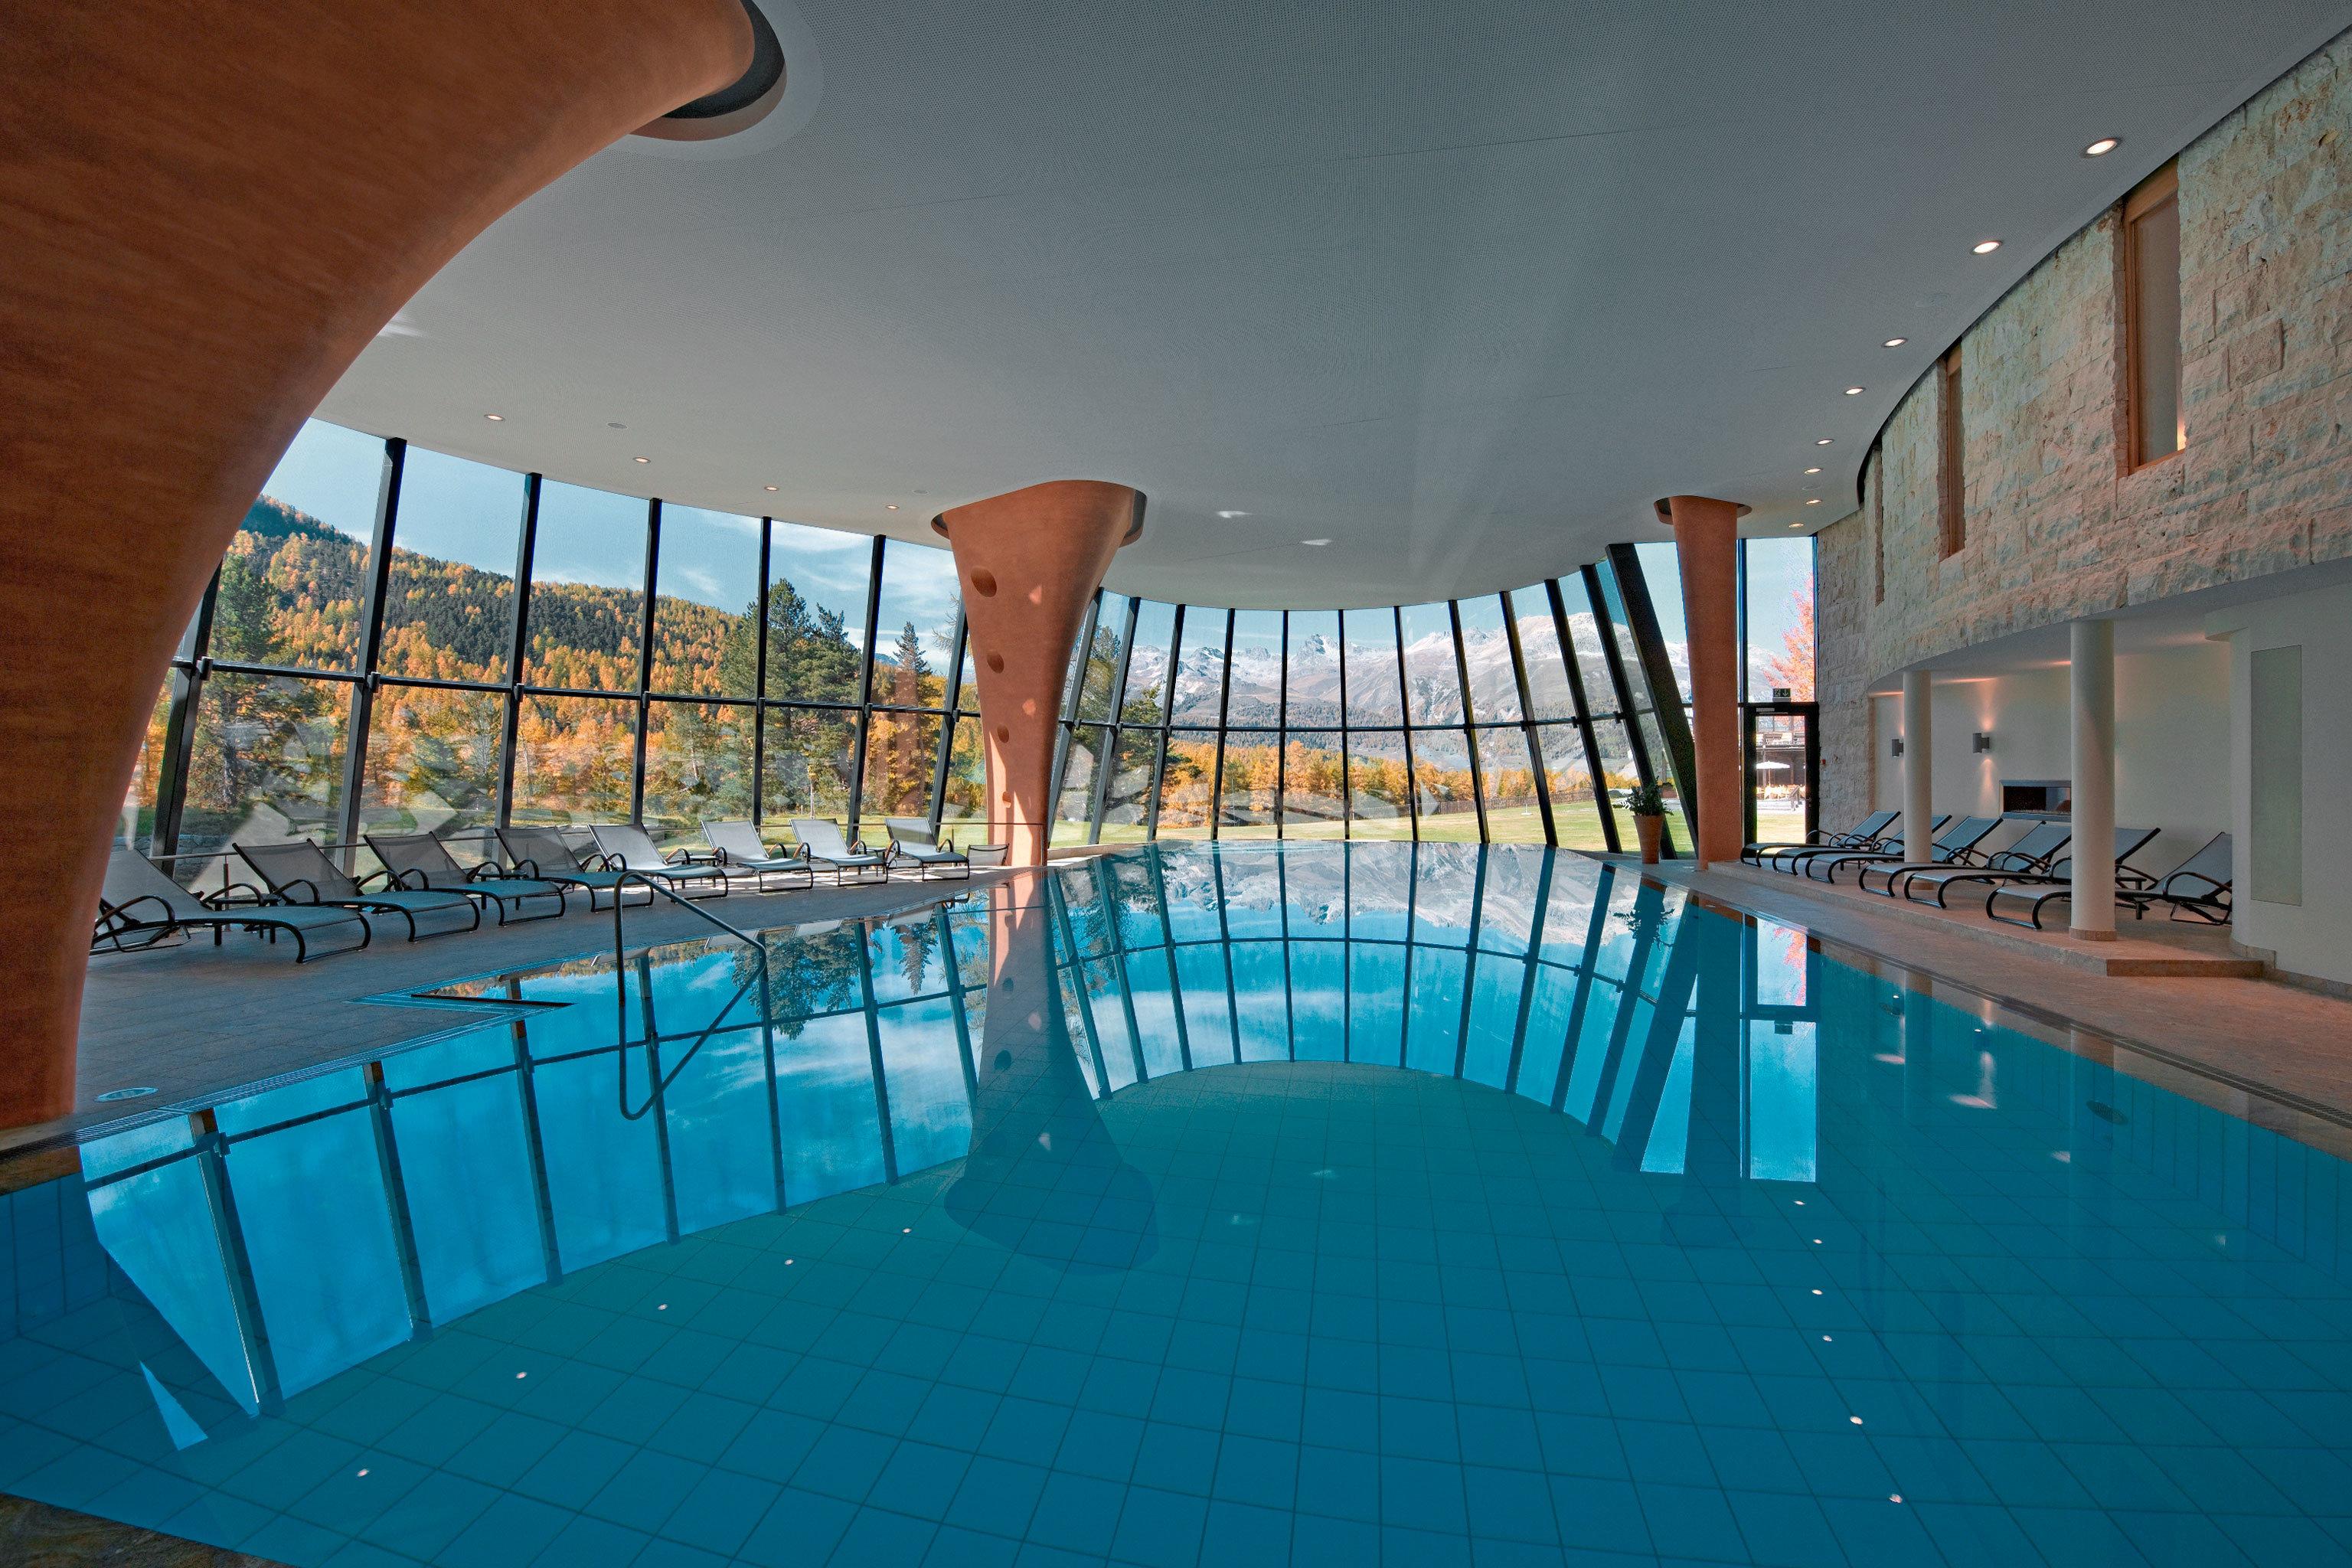 Scenic views Sport swimming pool leisure chair property Resort Pool